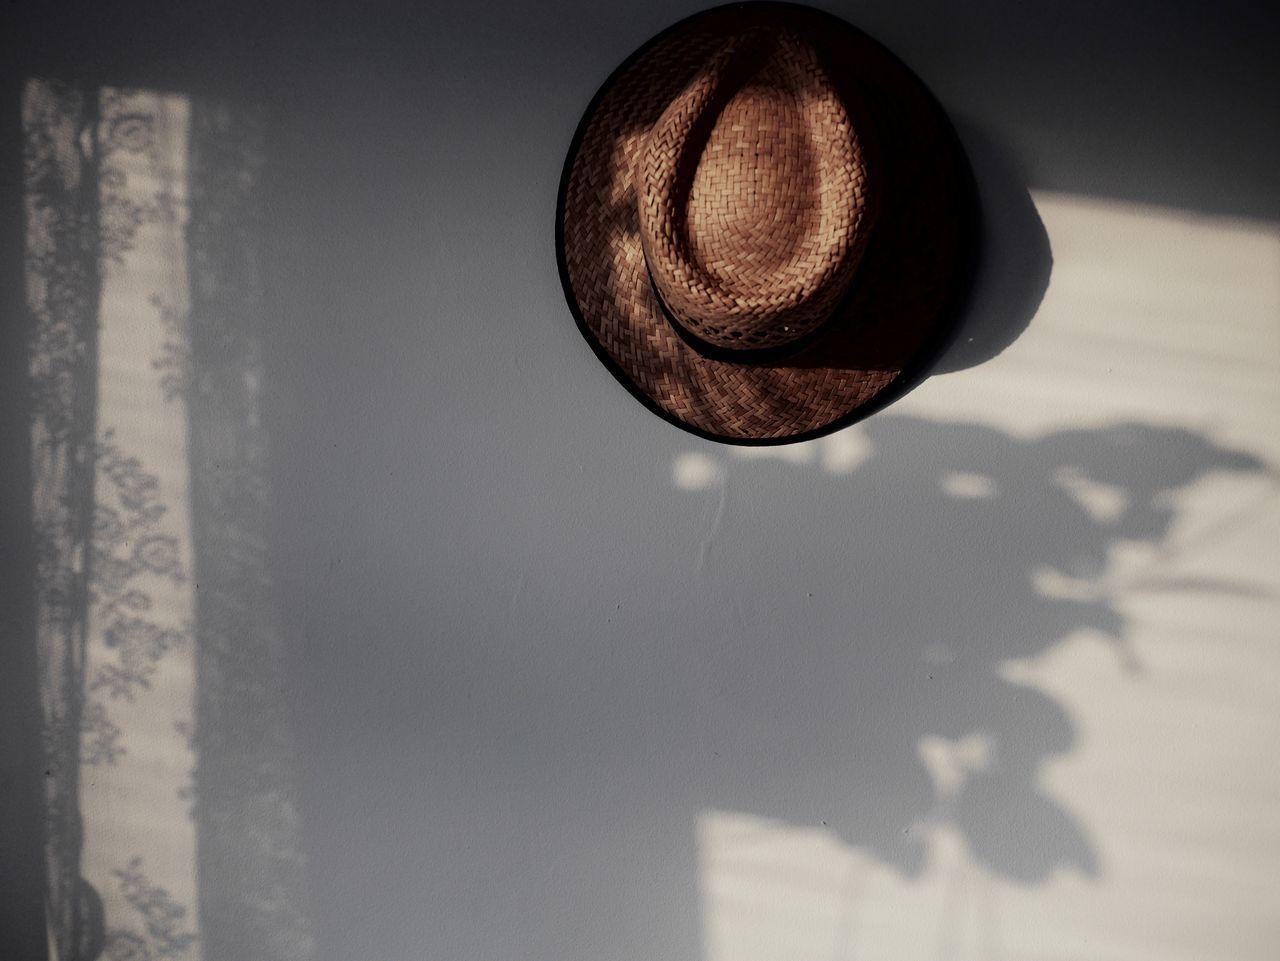 Beautiful stock photos of fall, indoors, close-up, selective focus, focus on foreground